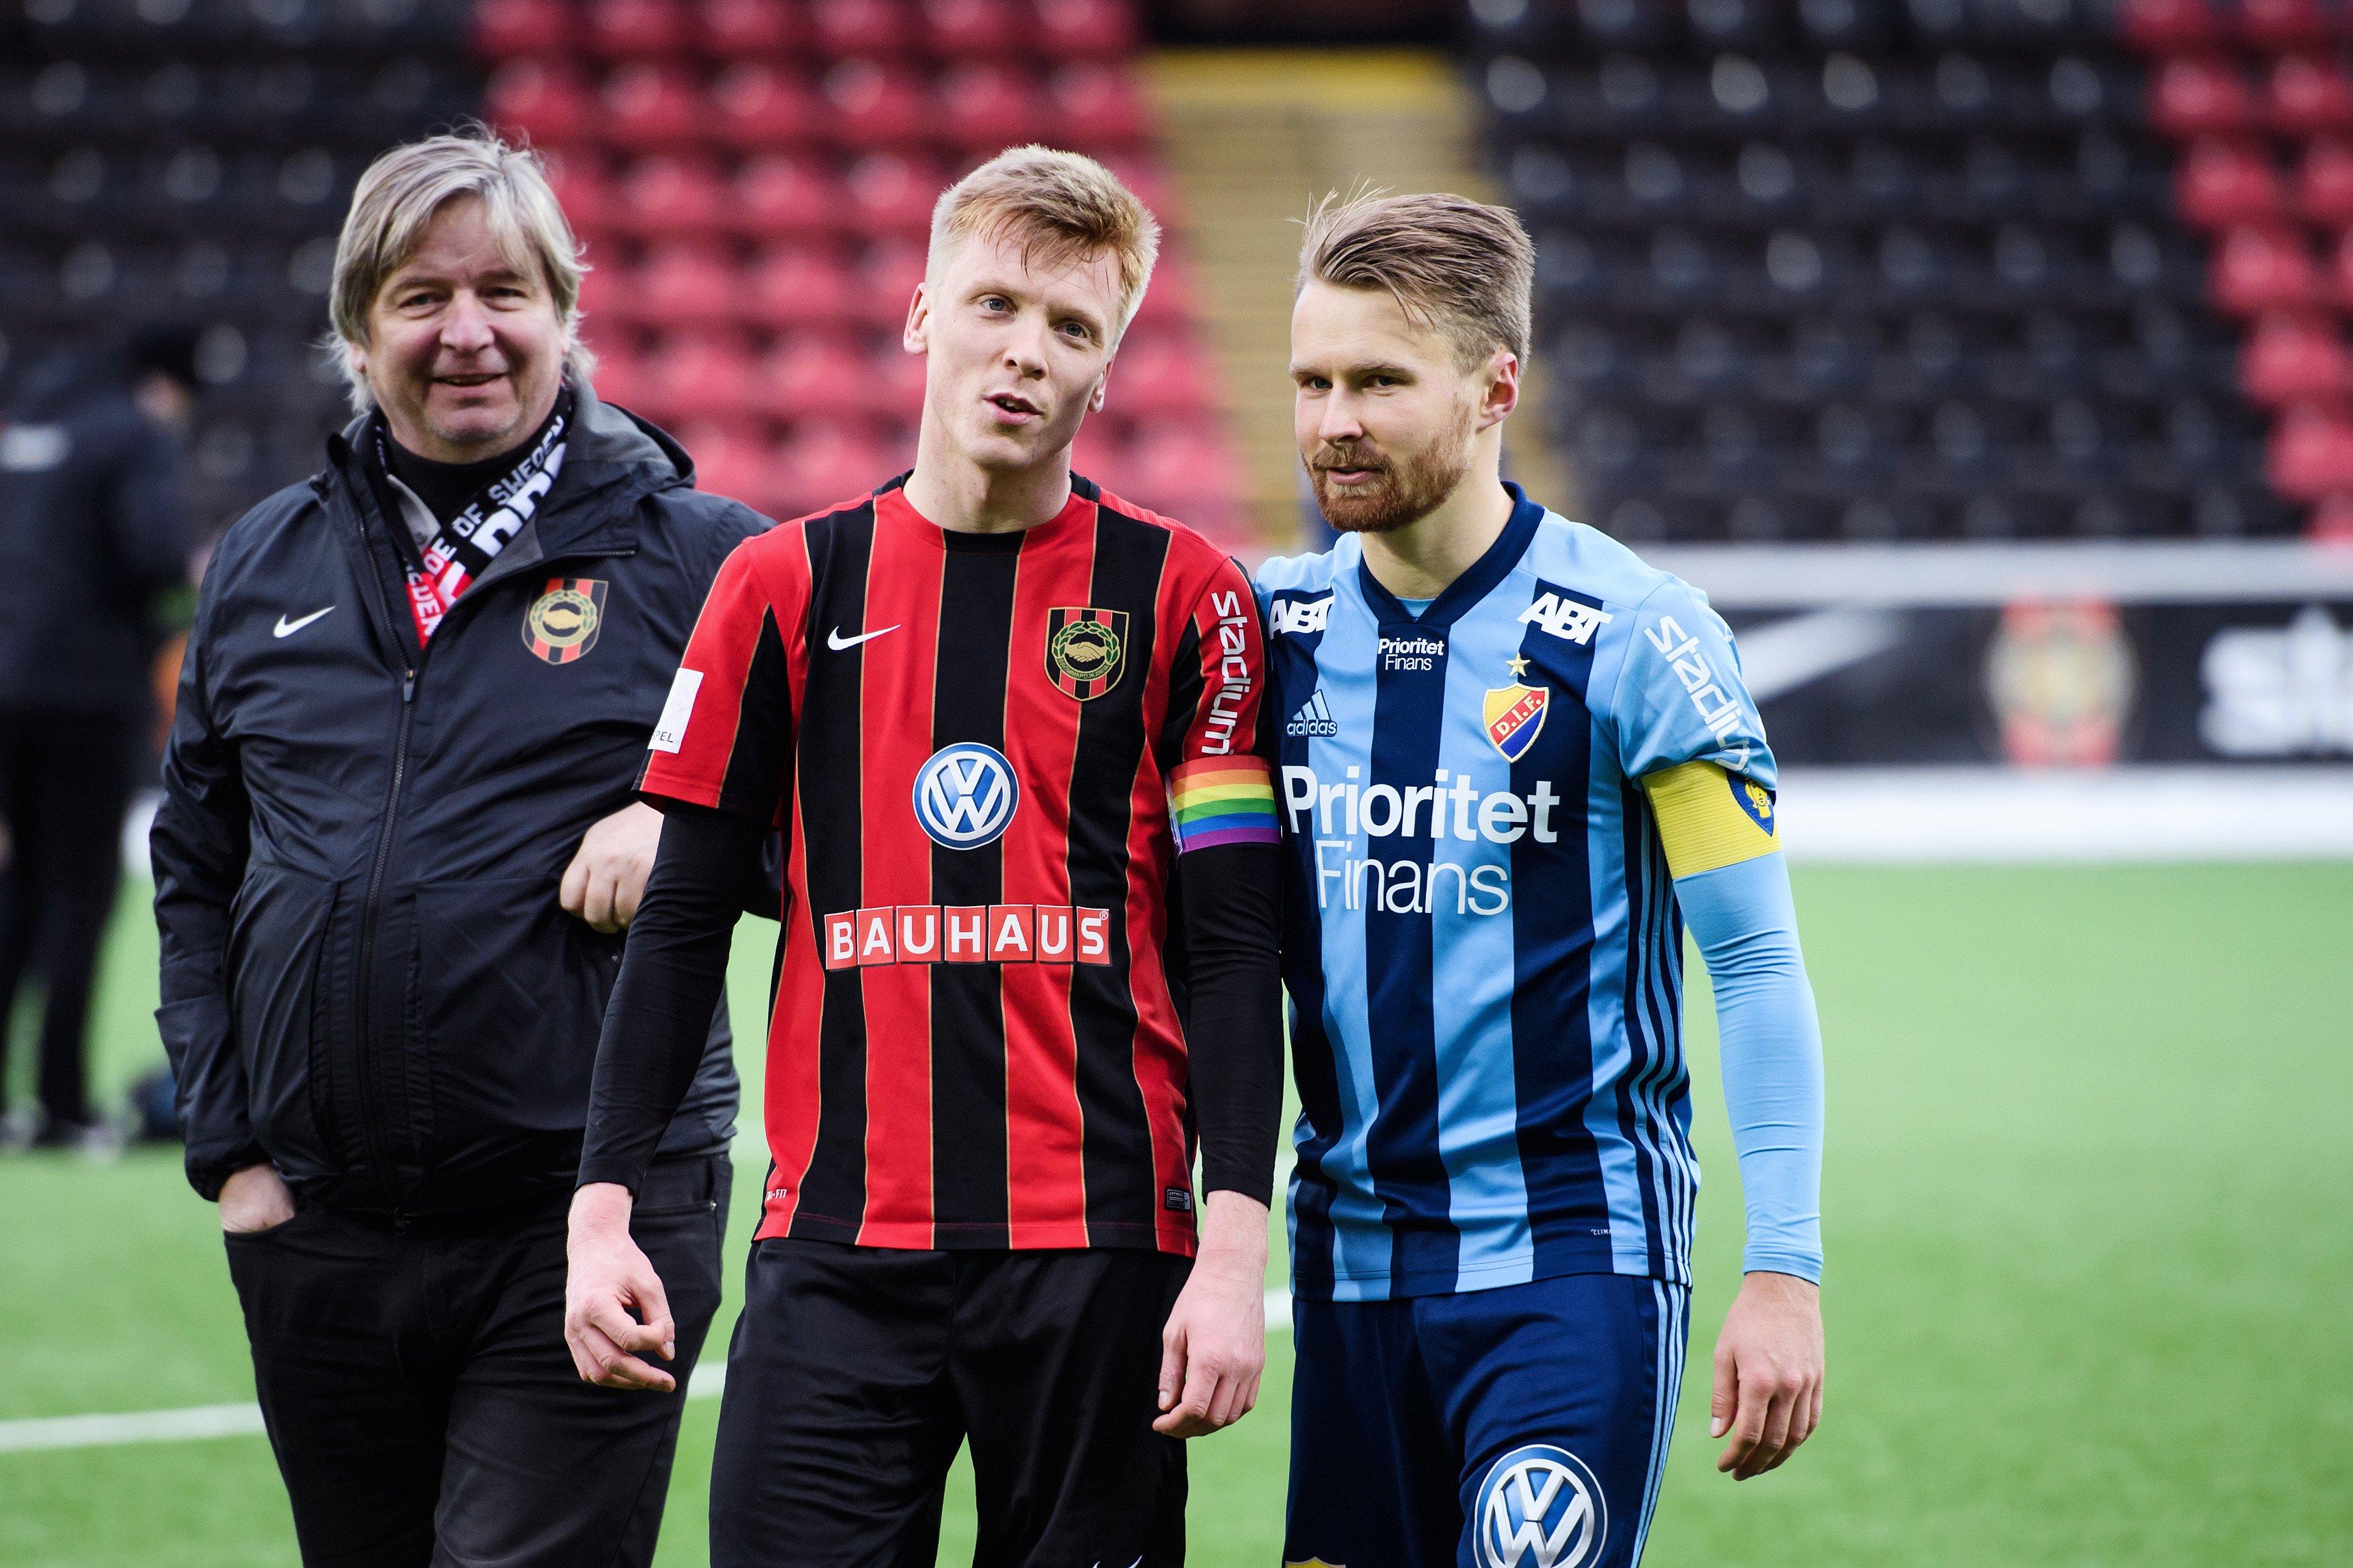 Sportbladets profiler om veckans grej i allsvenskan